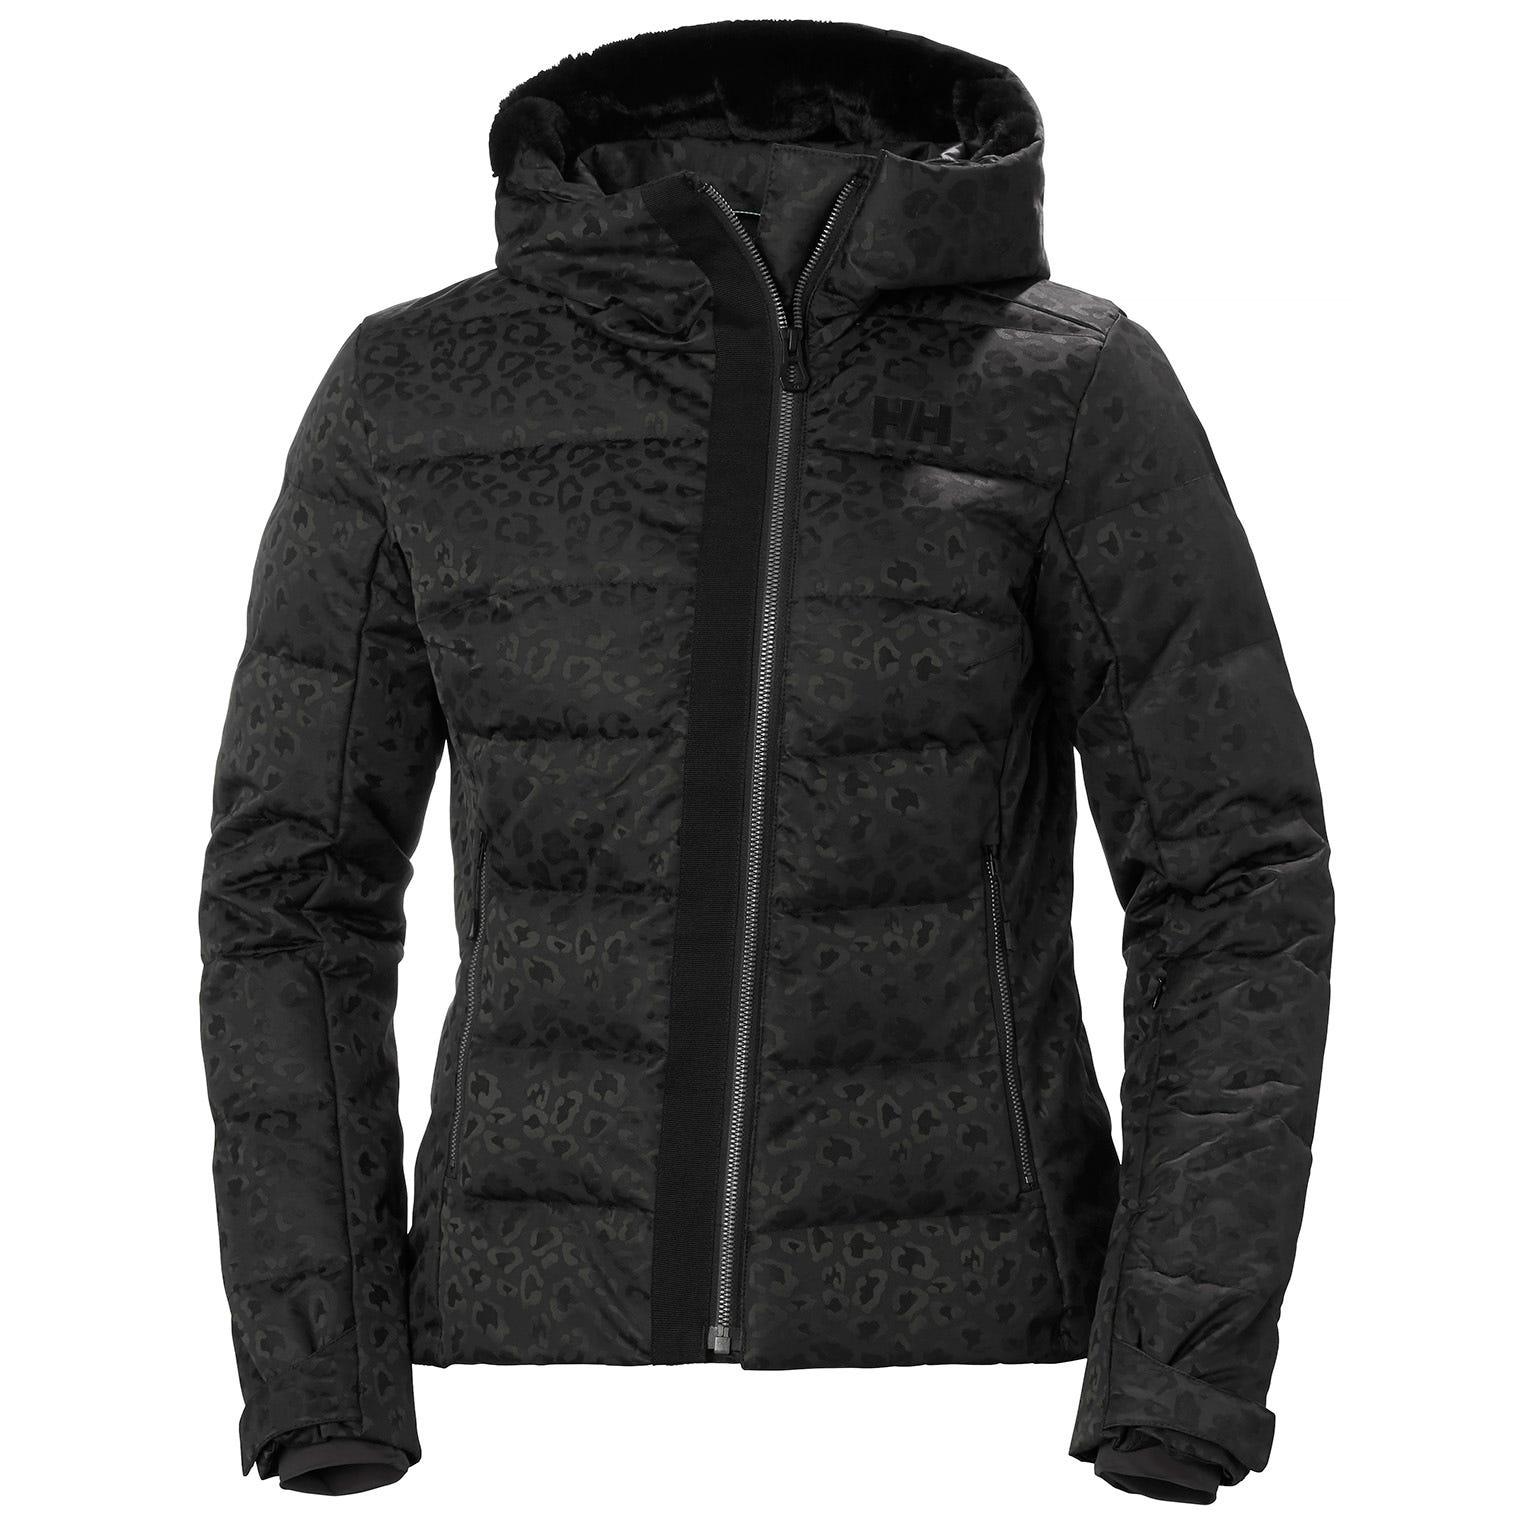 Helly Hansen Womens Valdisere Puffy Ski Jacket Black S